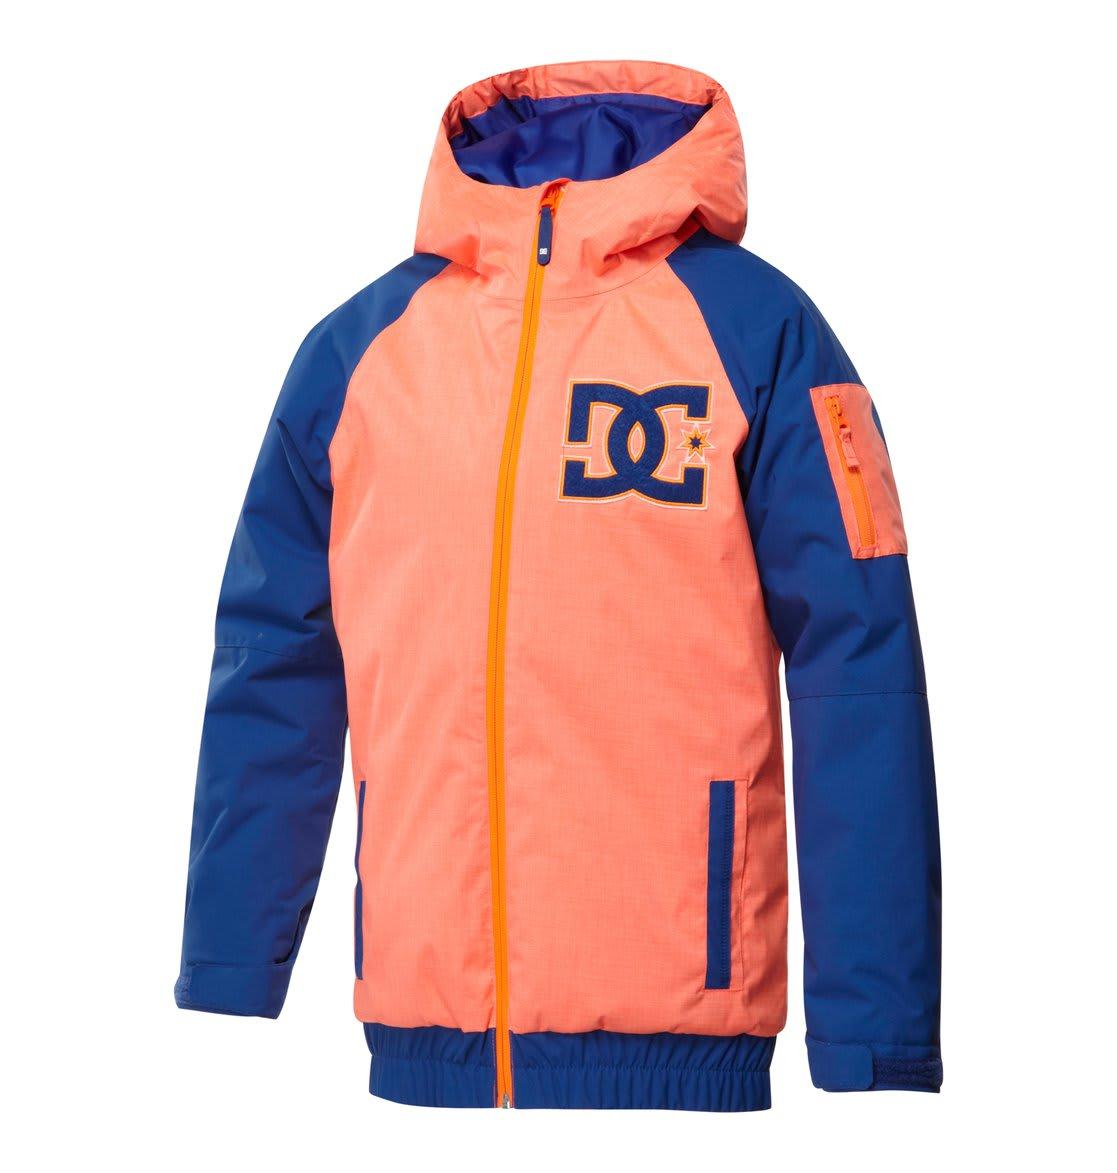 4ebbf8d71 DC Troop Snowboard Jacket - thumbnail 2